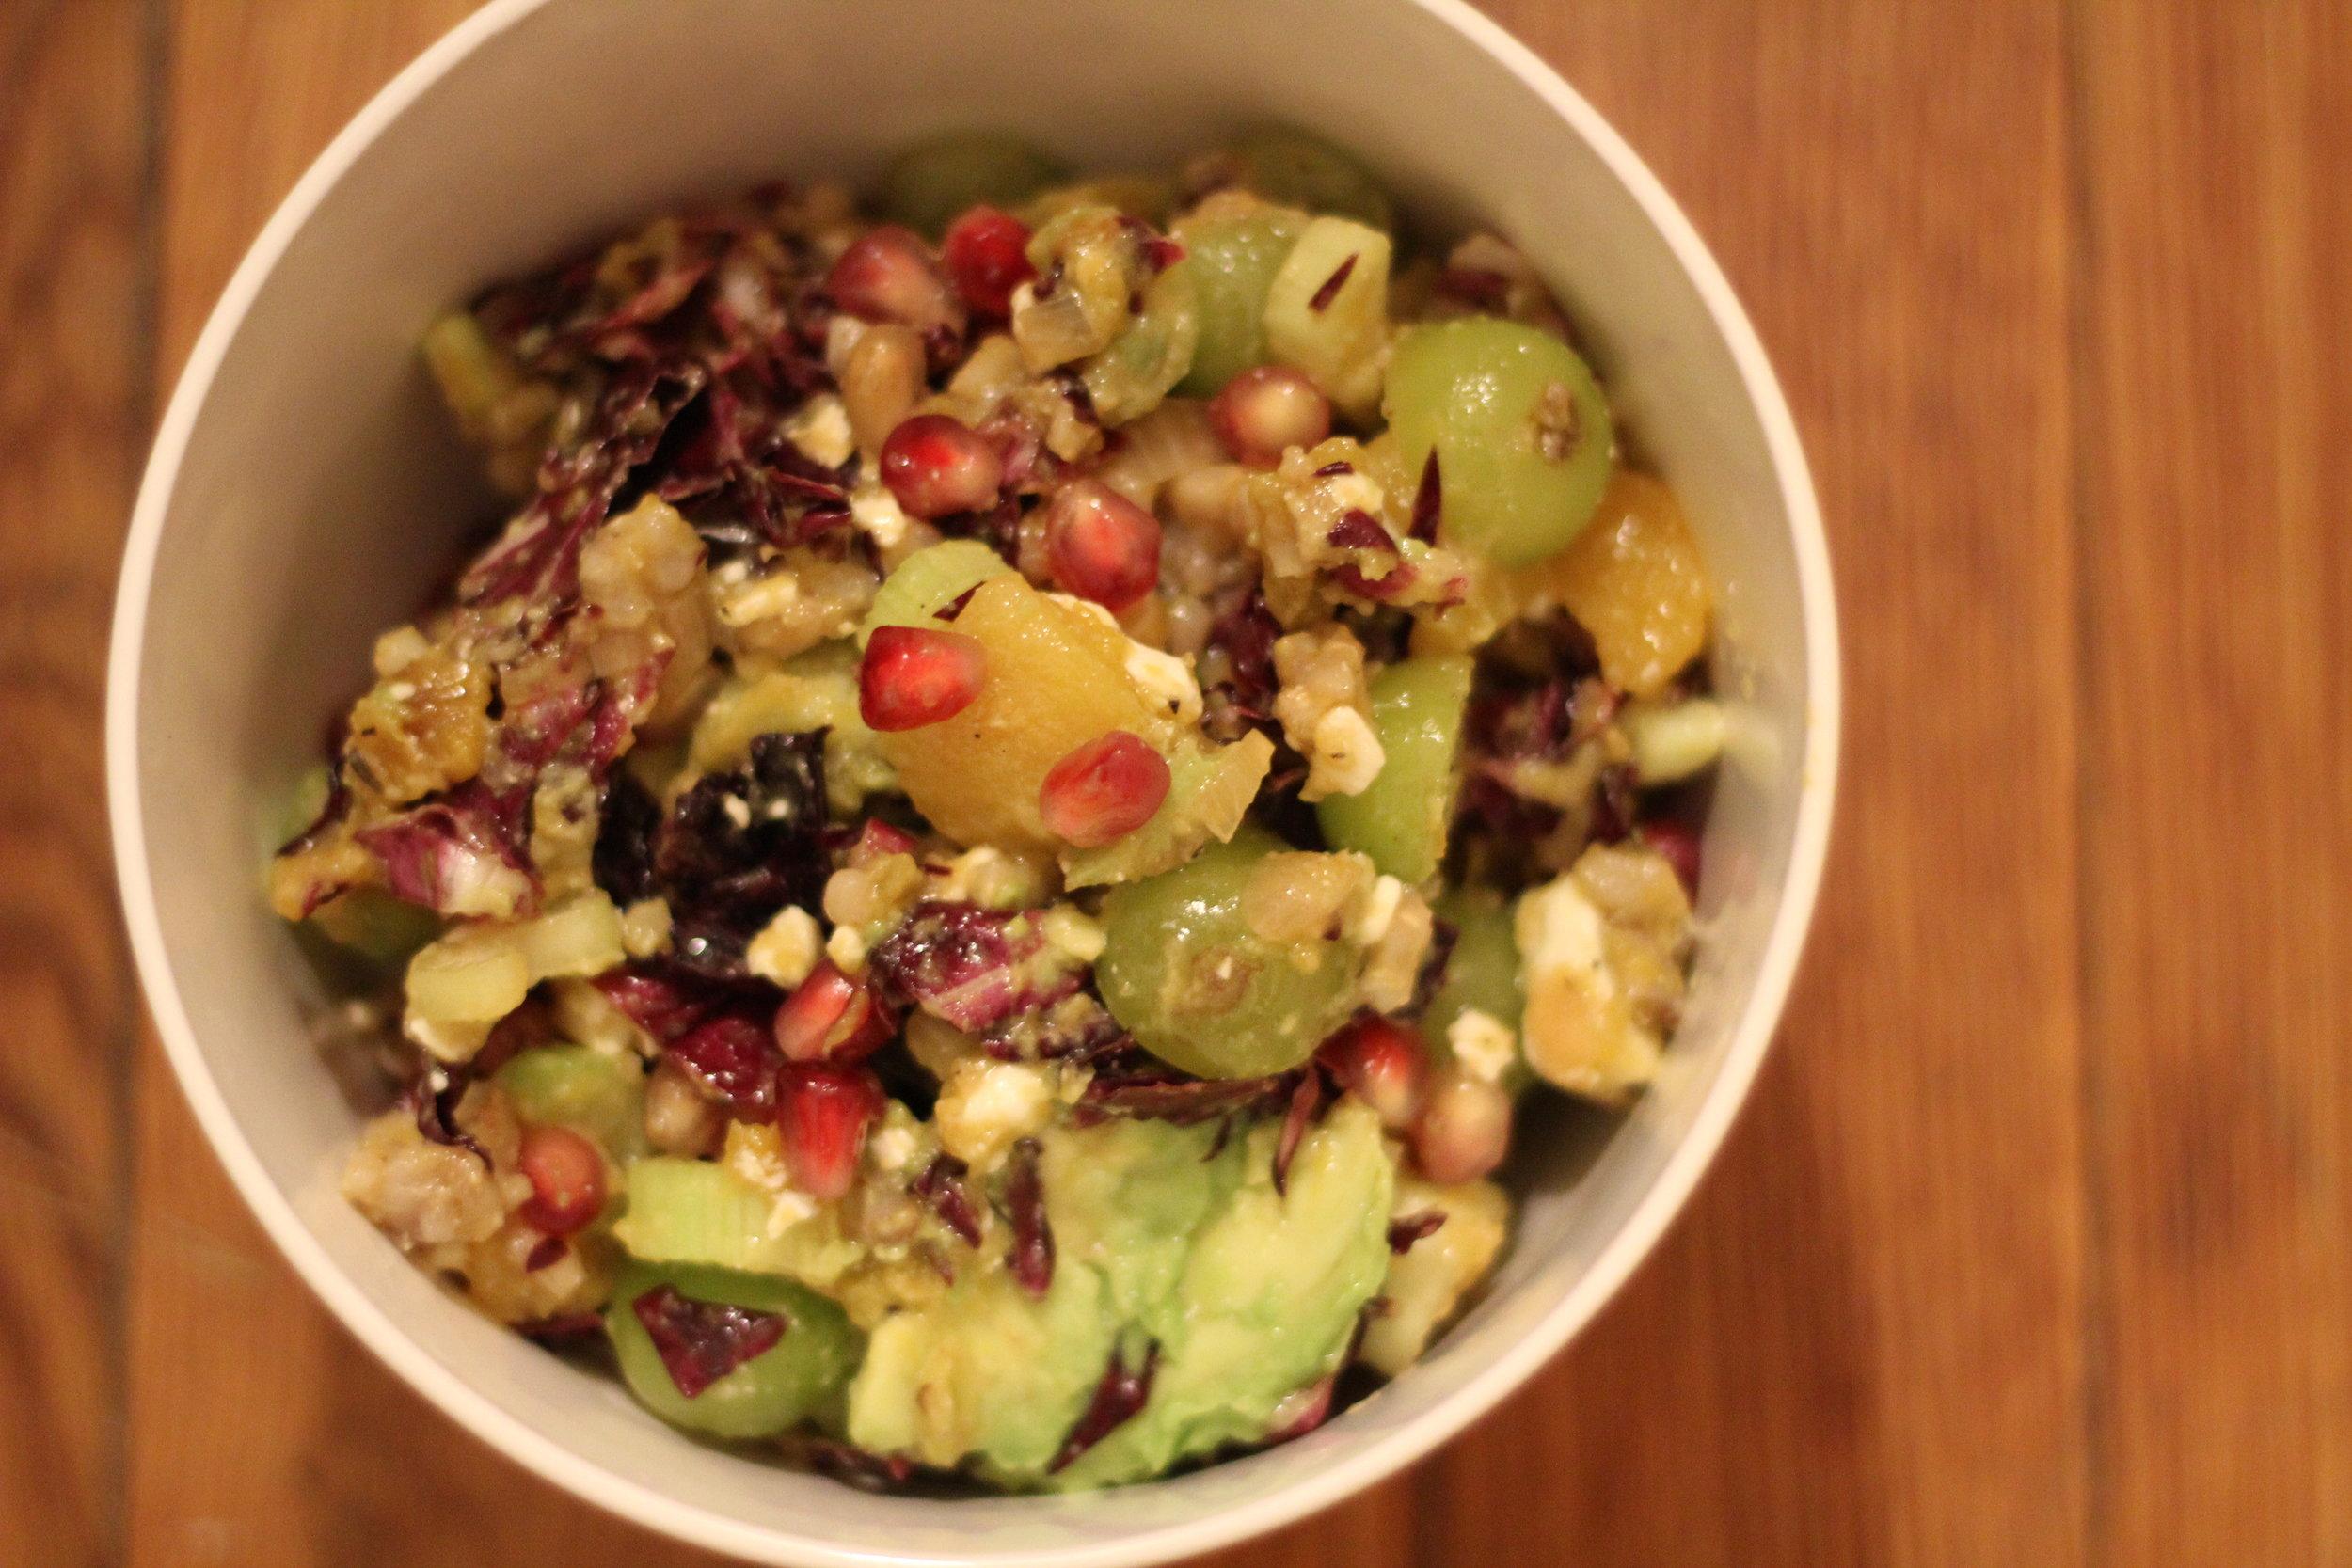 wintery chopped salad - radicchio, toasted walnuts, chopped celery, pomegranate seeds